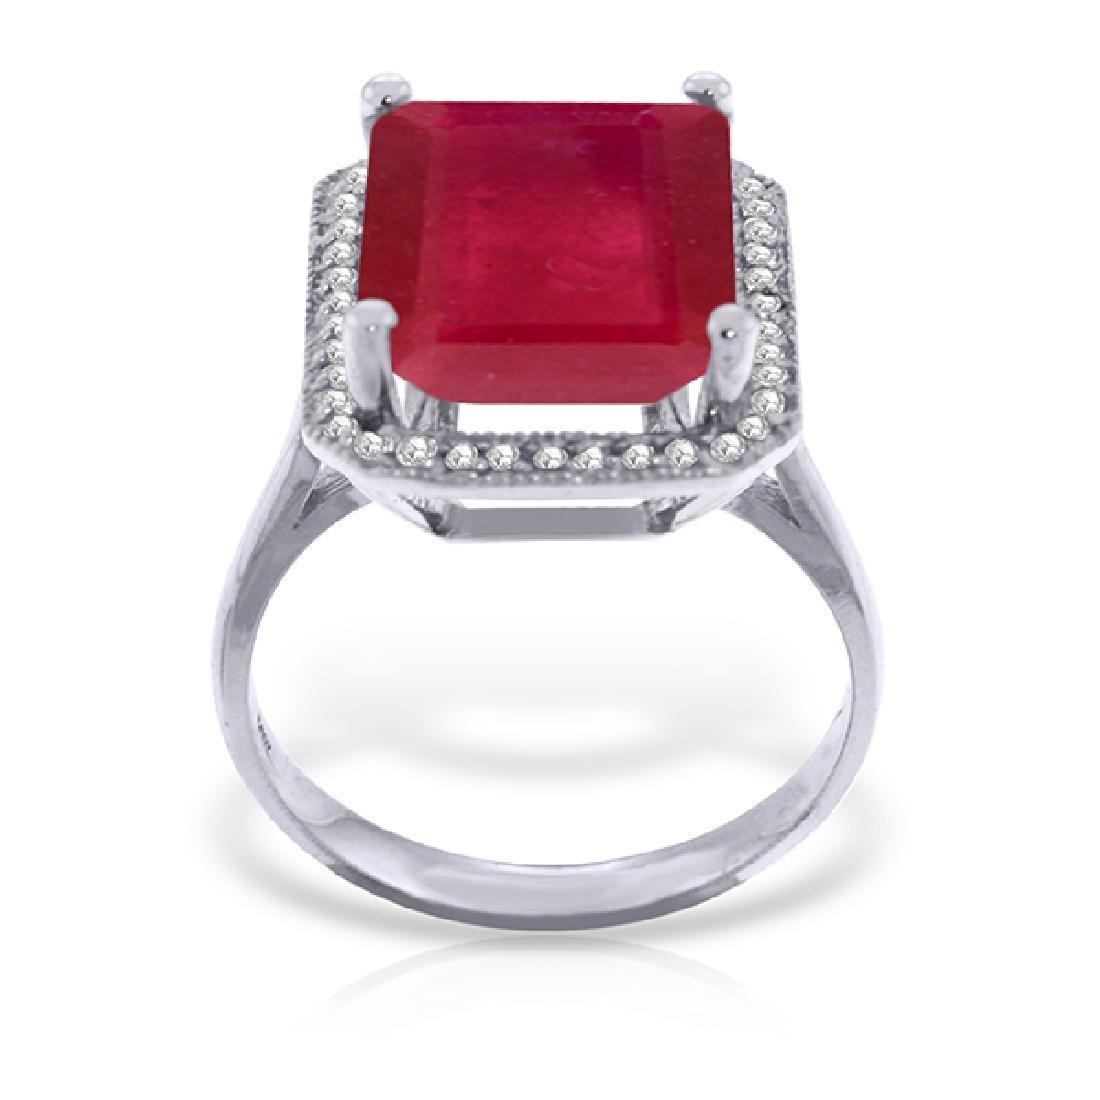 Genuine 7.45 ctw Ruby & Diamond Ring Jewelry 14KT White